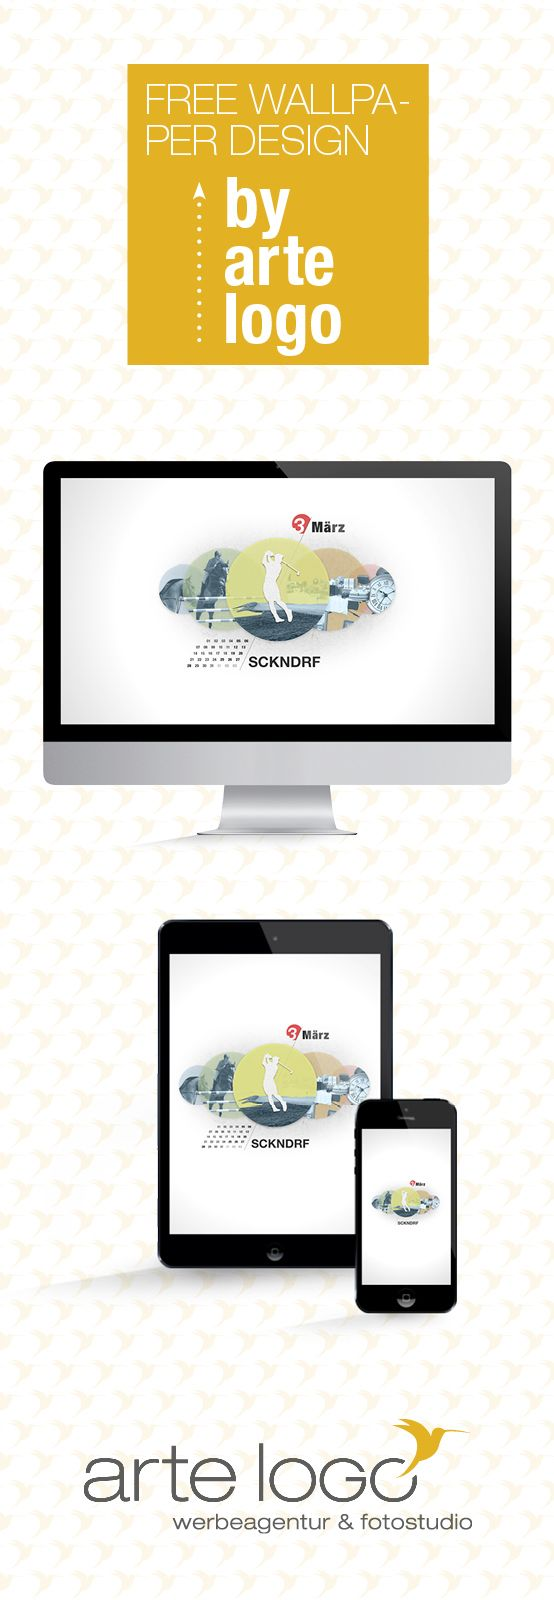 Free Wallpaper for Desktop, iPhone and iPad by arte-logo.de Free Download, Kalender 2016, selfmade, März Sickendorf Vogelsbergkreis